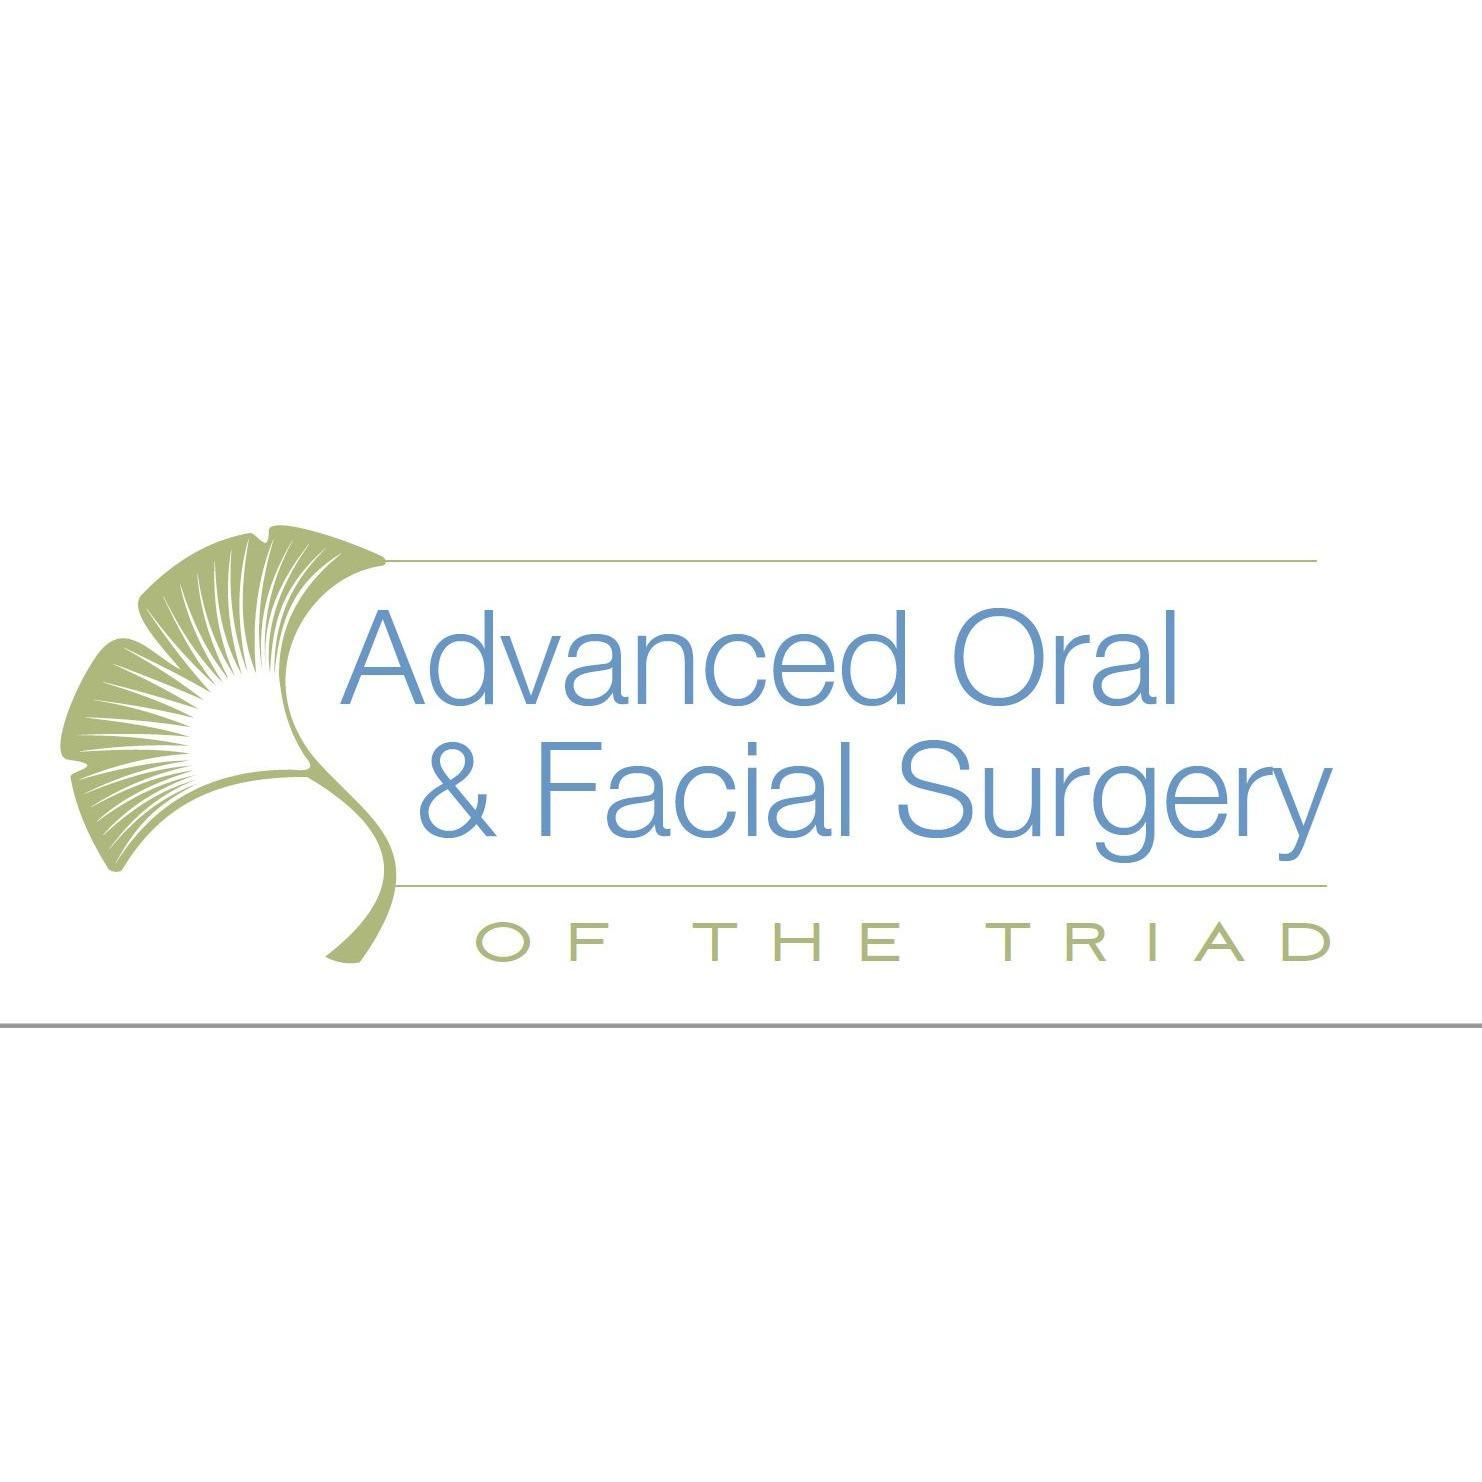 Advanced Oral & Facial Surgery of the Triad